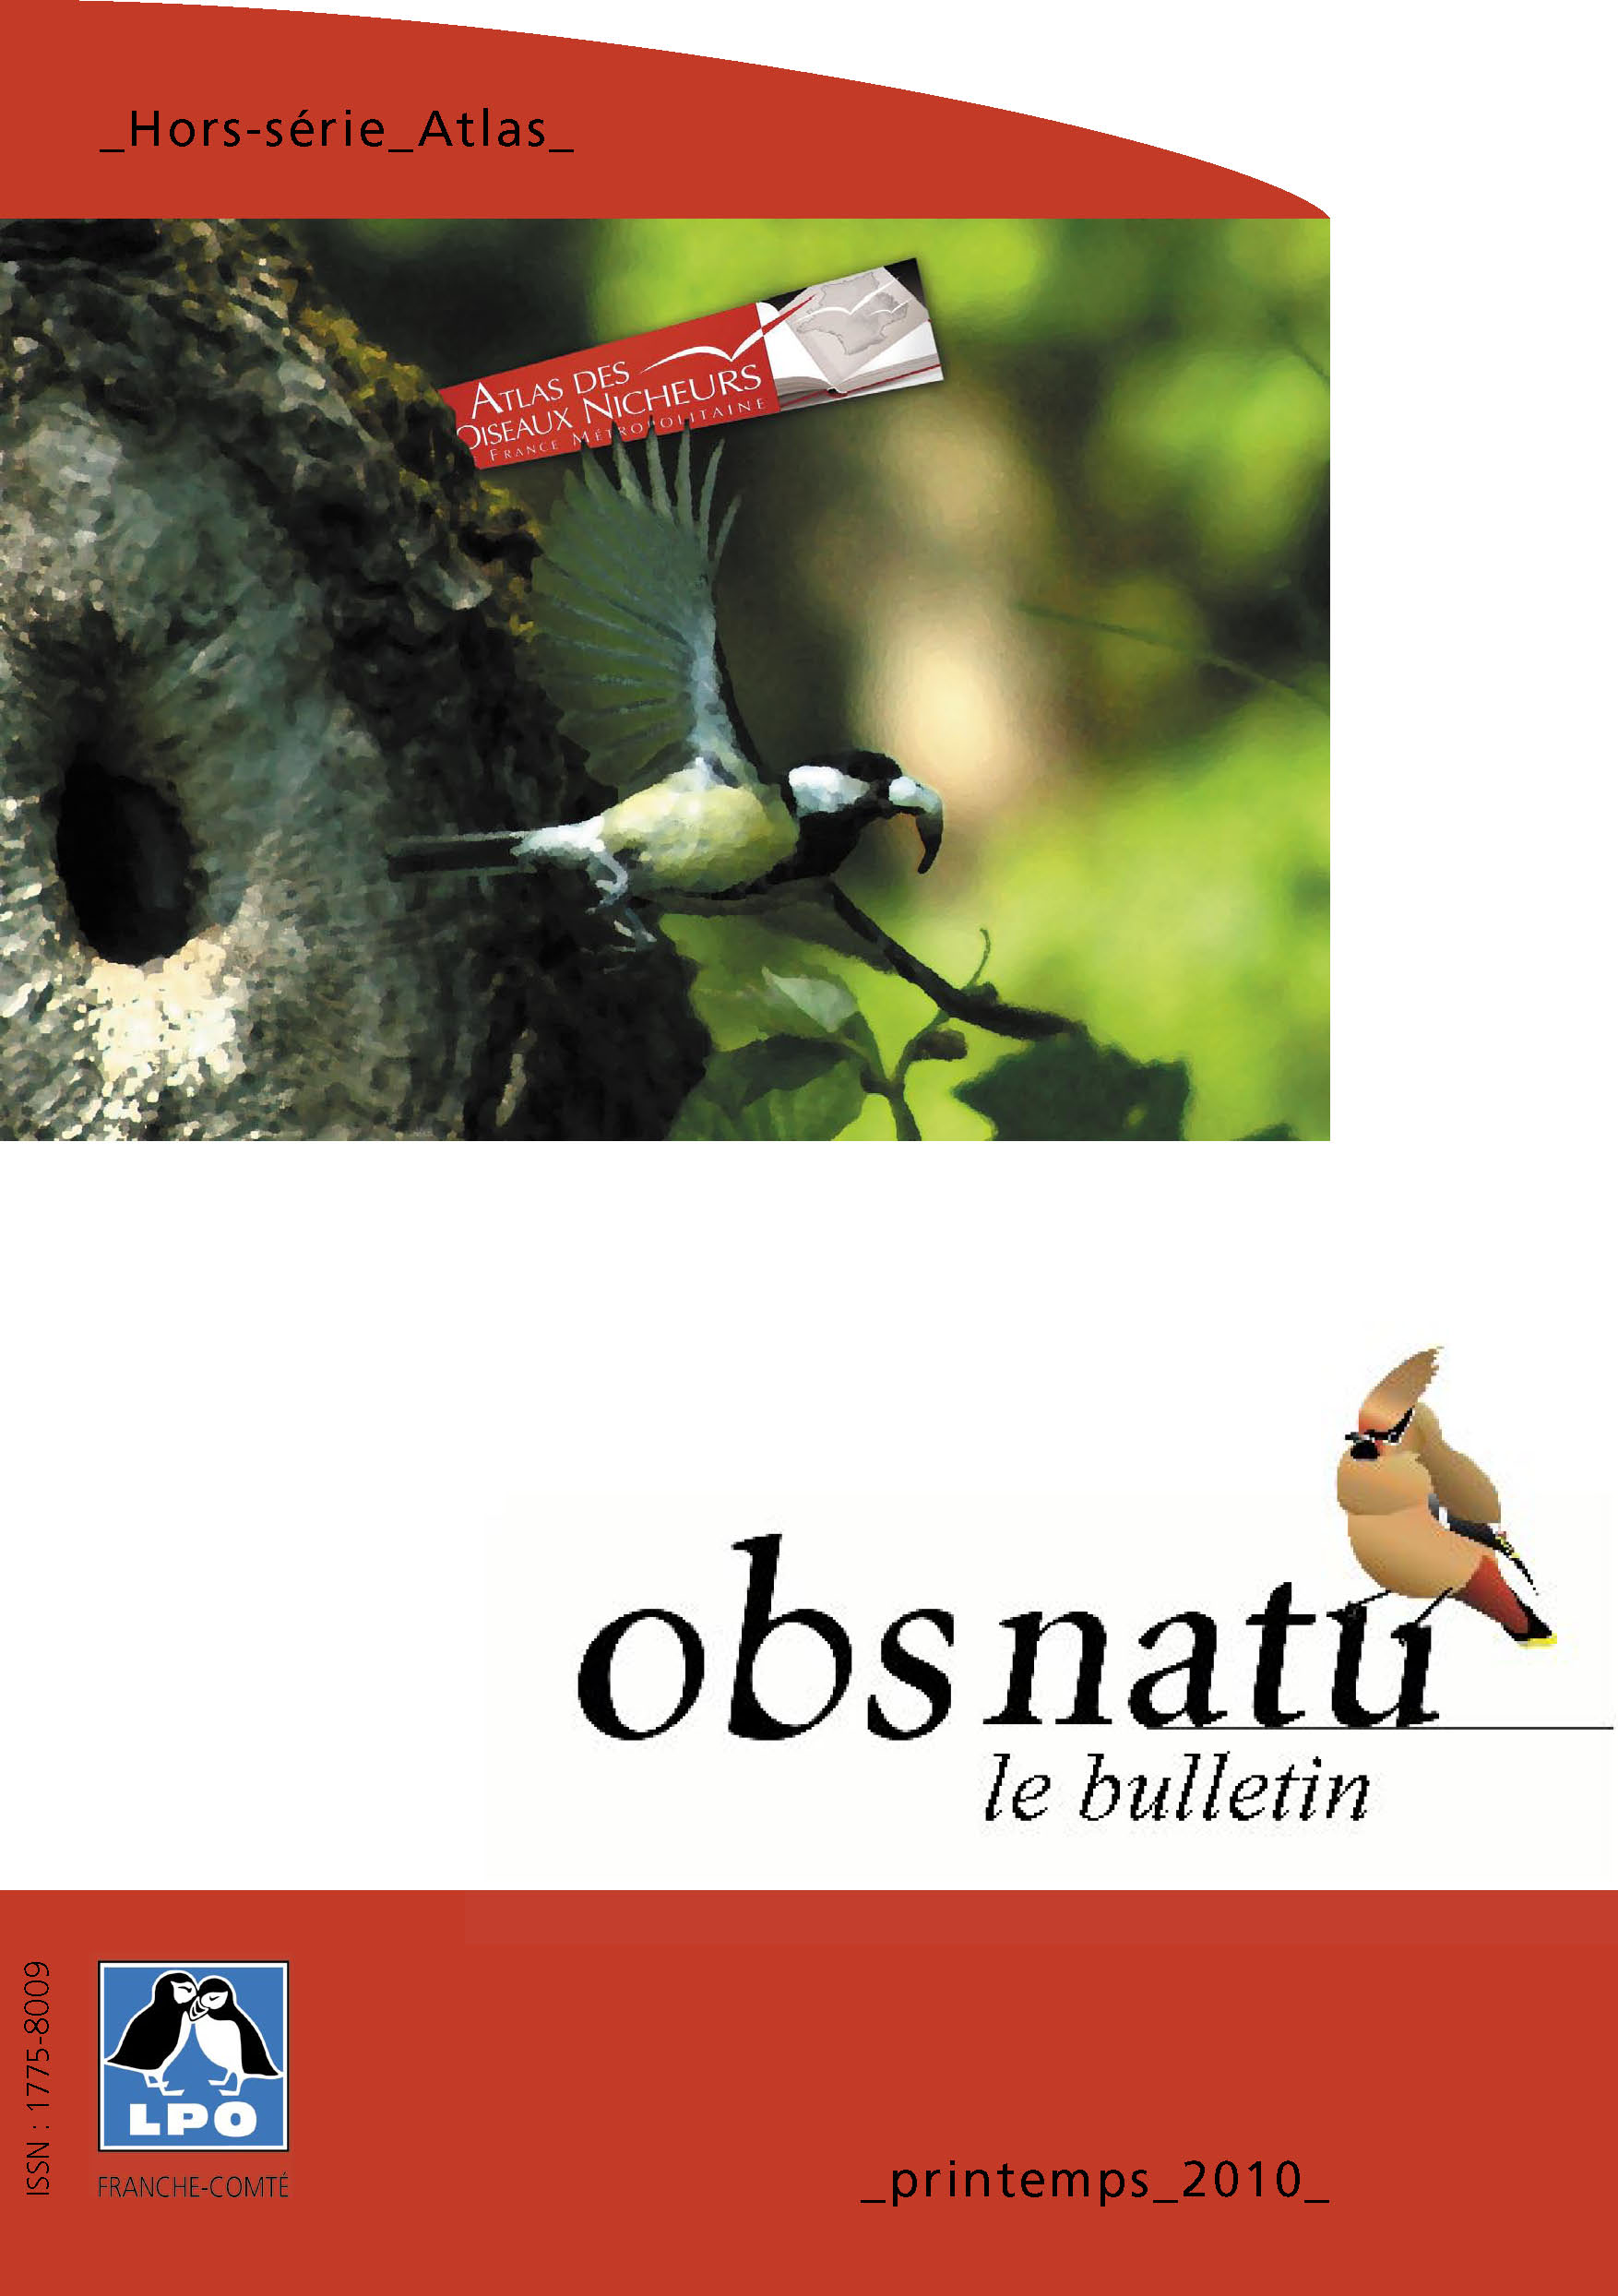 http://files.biolovision.net/franche-comte.lpo.fr/userfiles/publications/ObsnatuHSAtlasPage01.jpg